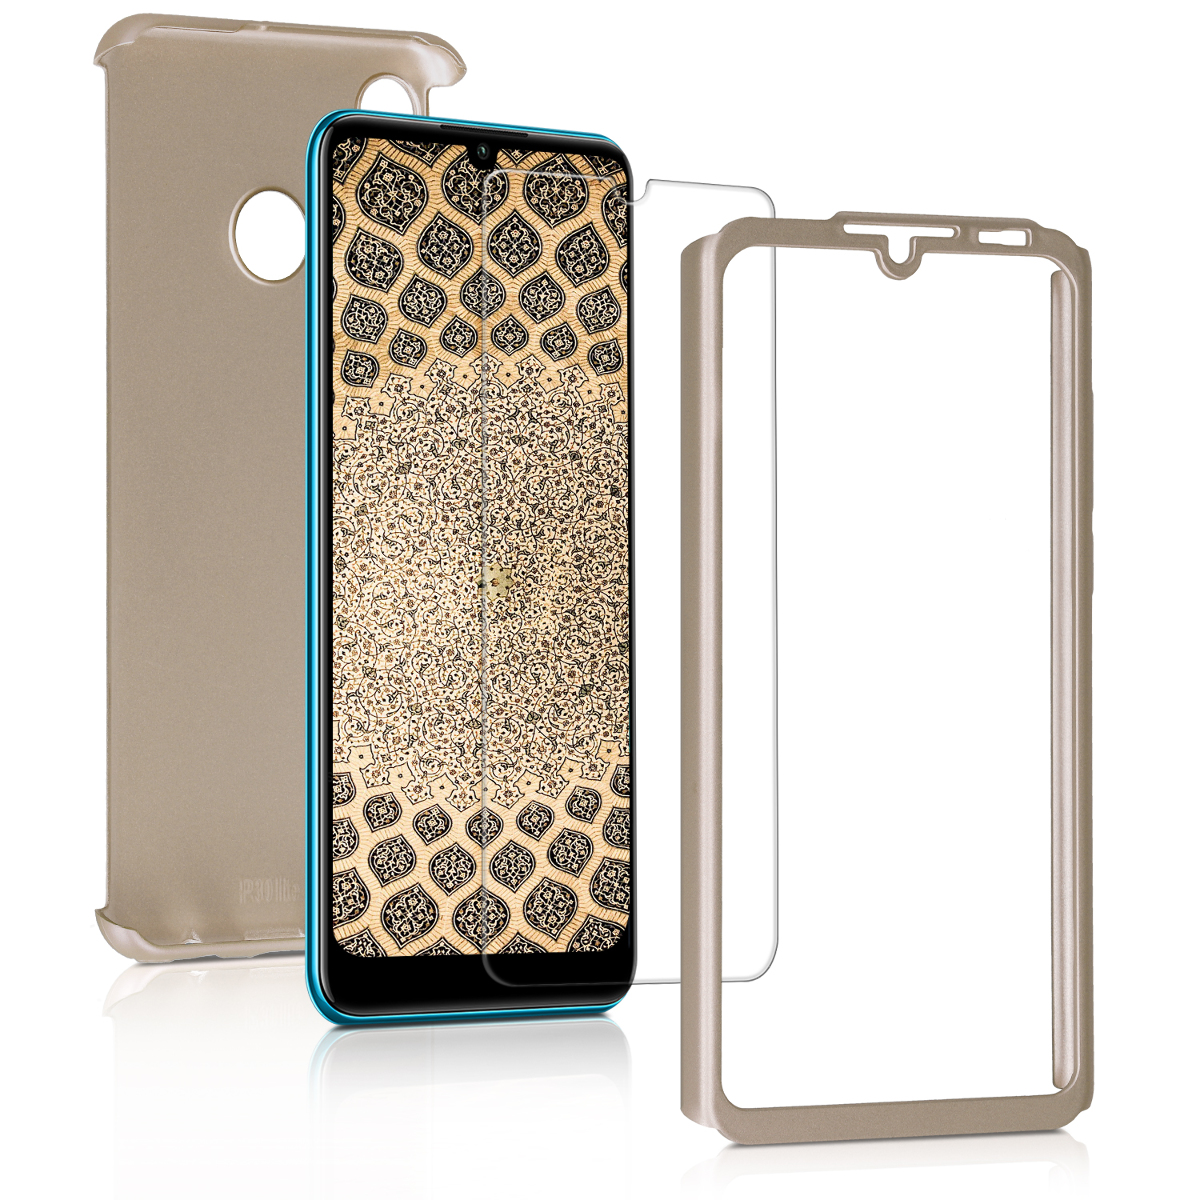 KW Θήκη Full Body Huawei P30 Lite & Tempered Glass - Metallic Gold (47508.66)